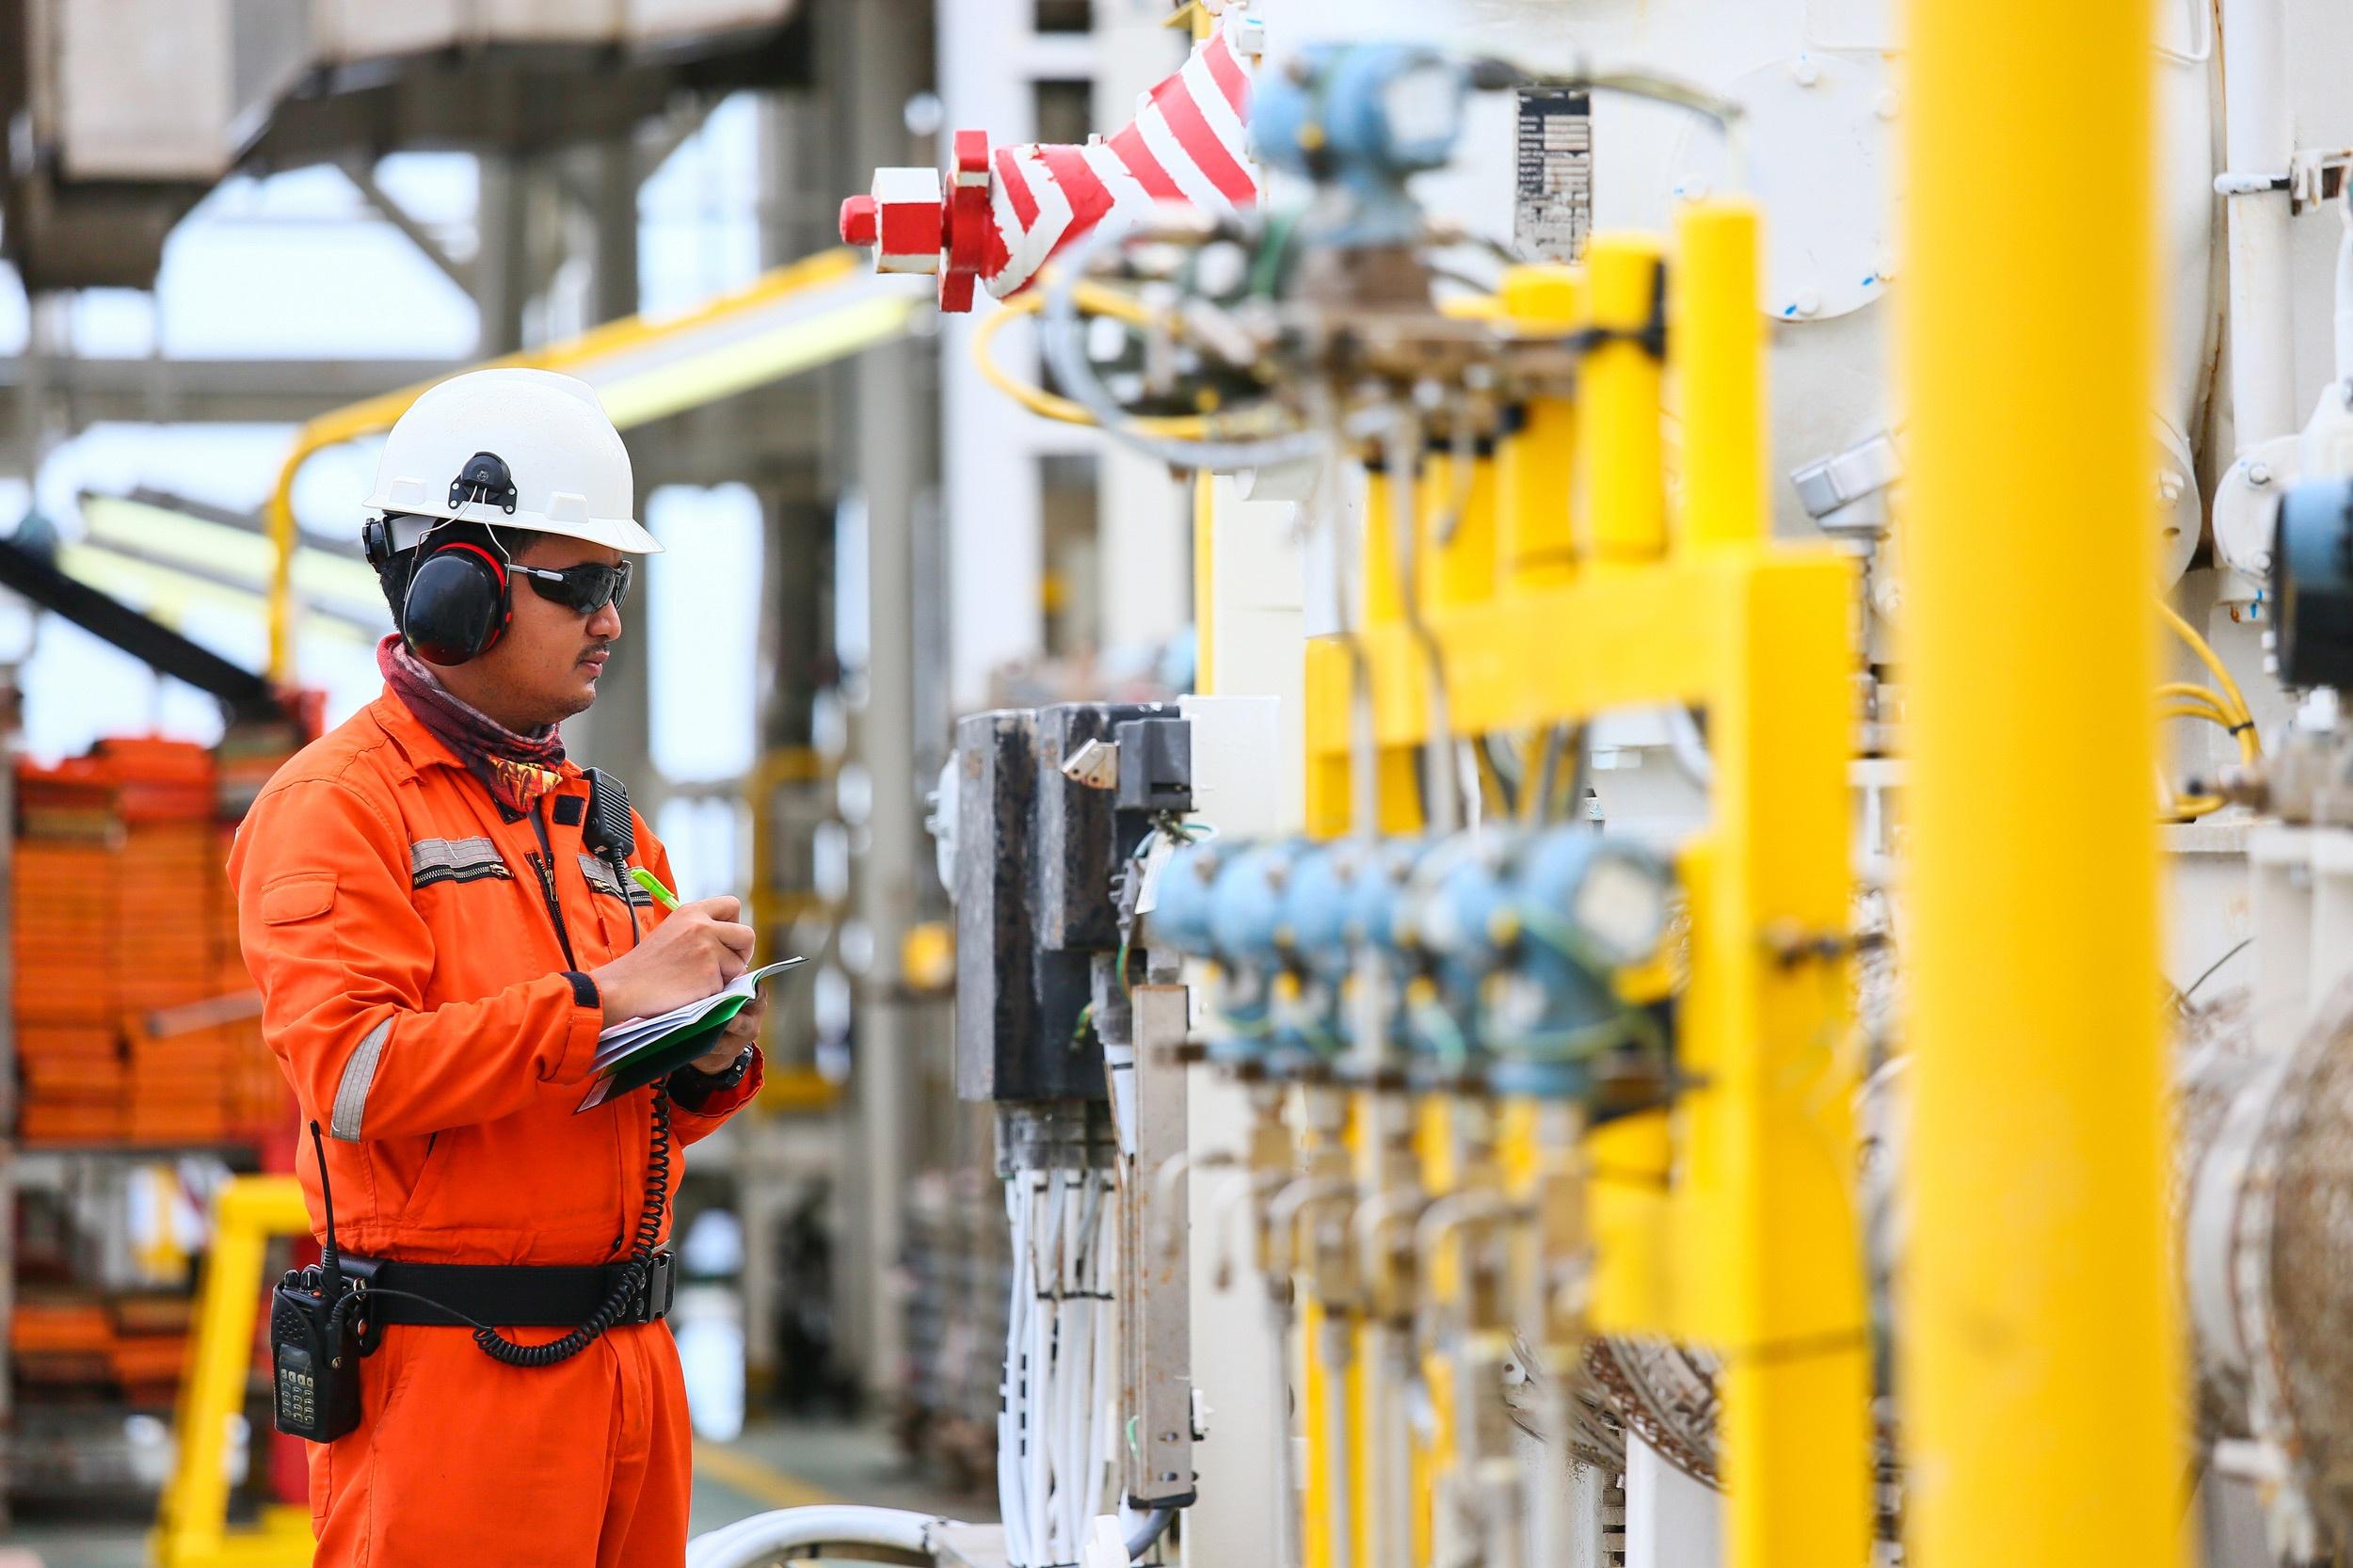 man in industrial environment monitoring equipment